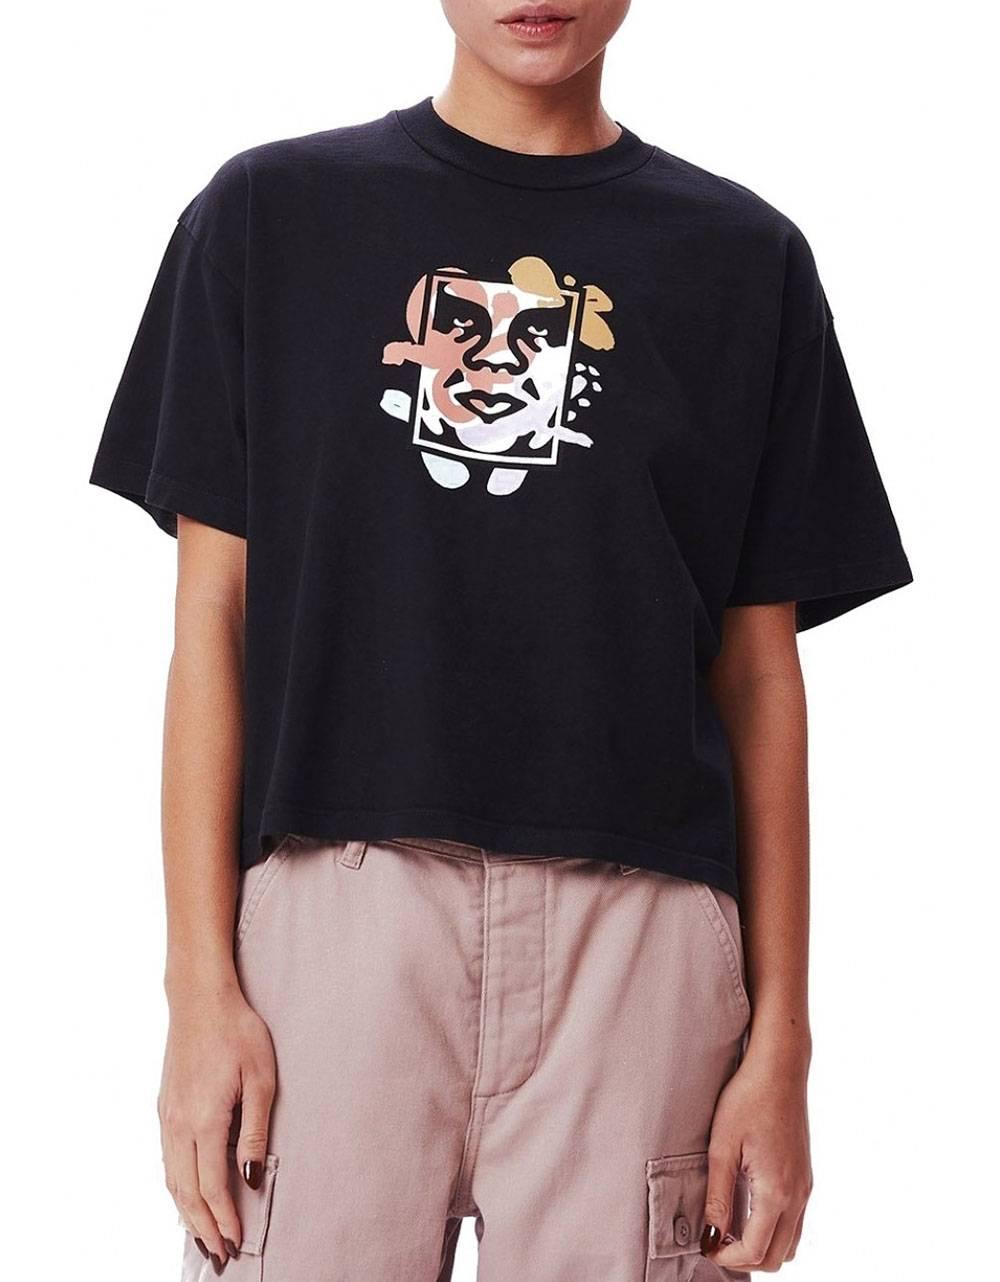 Obey Woman flower dance custom crop tee - off black obey T-shirt 36,89€